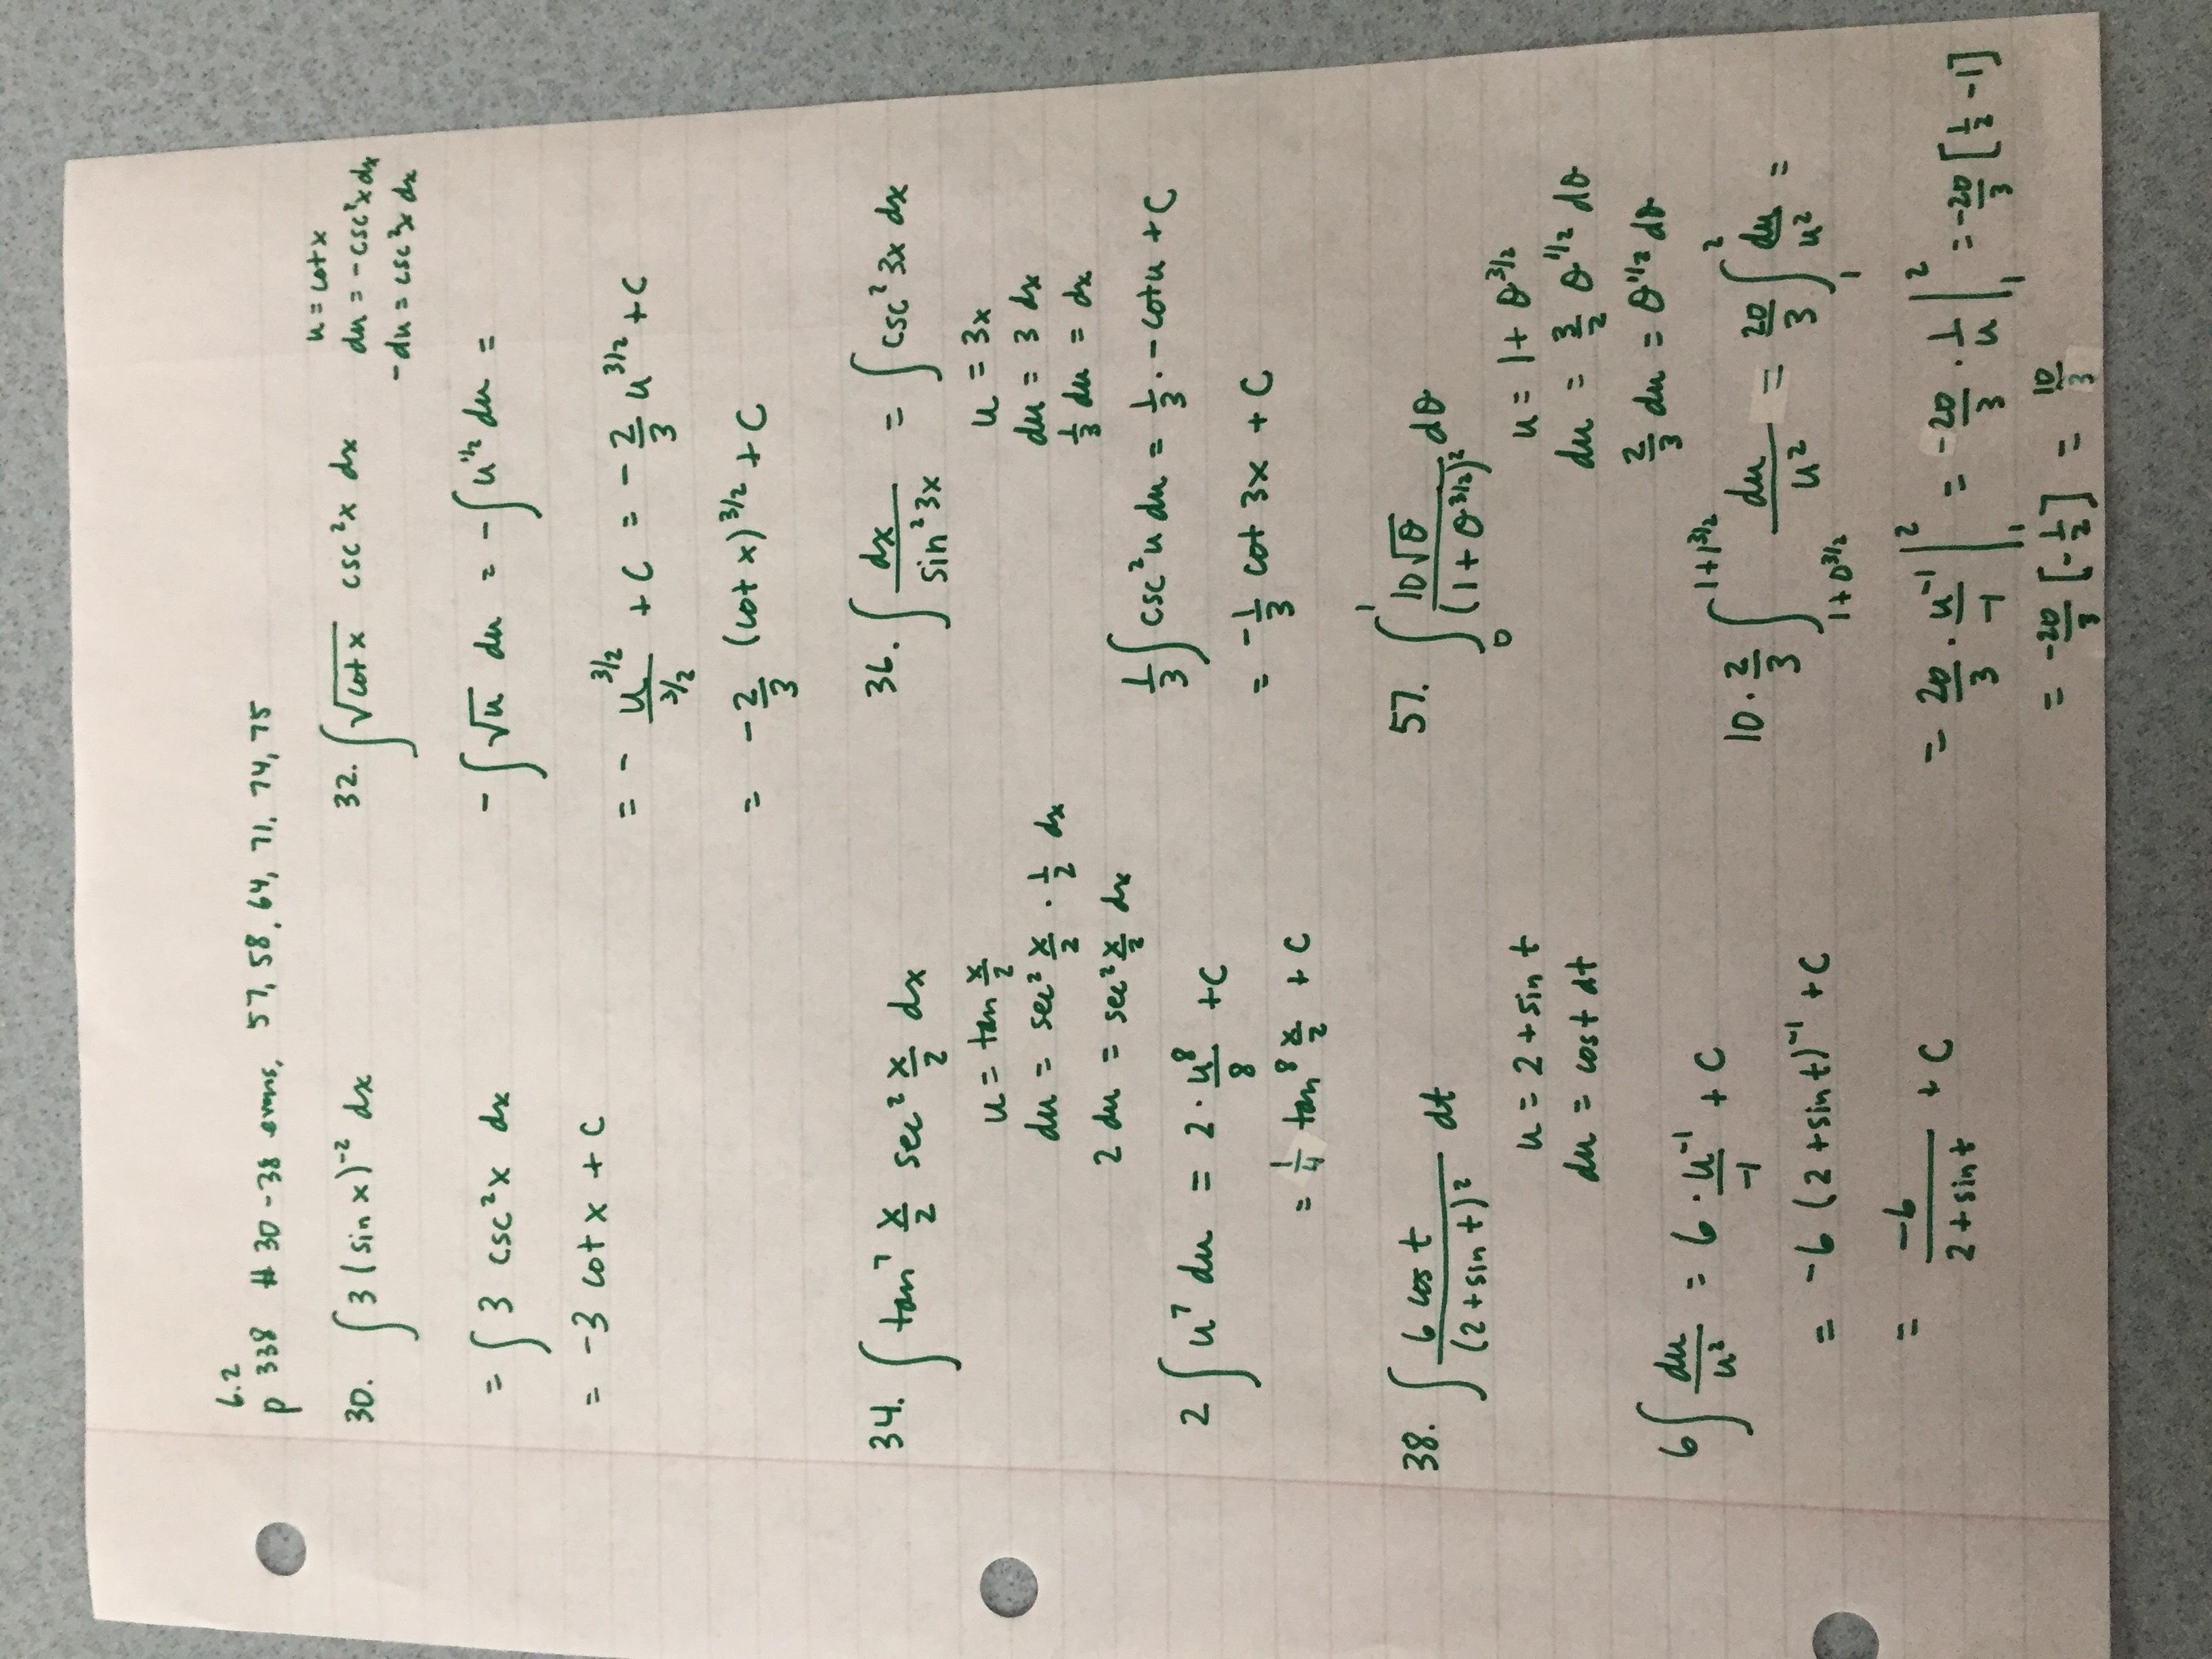 Mcconaghy Alexa Ap Calculus Bc